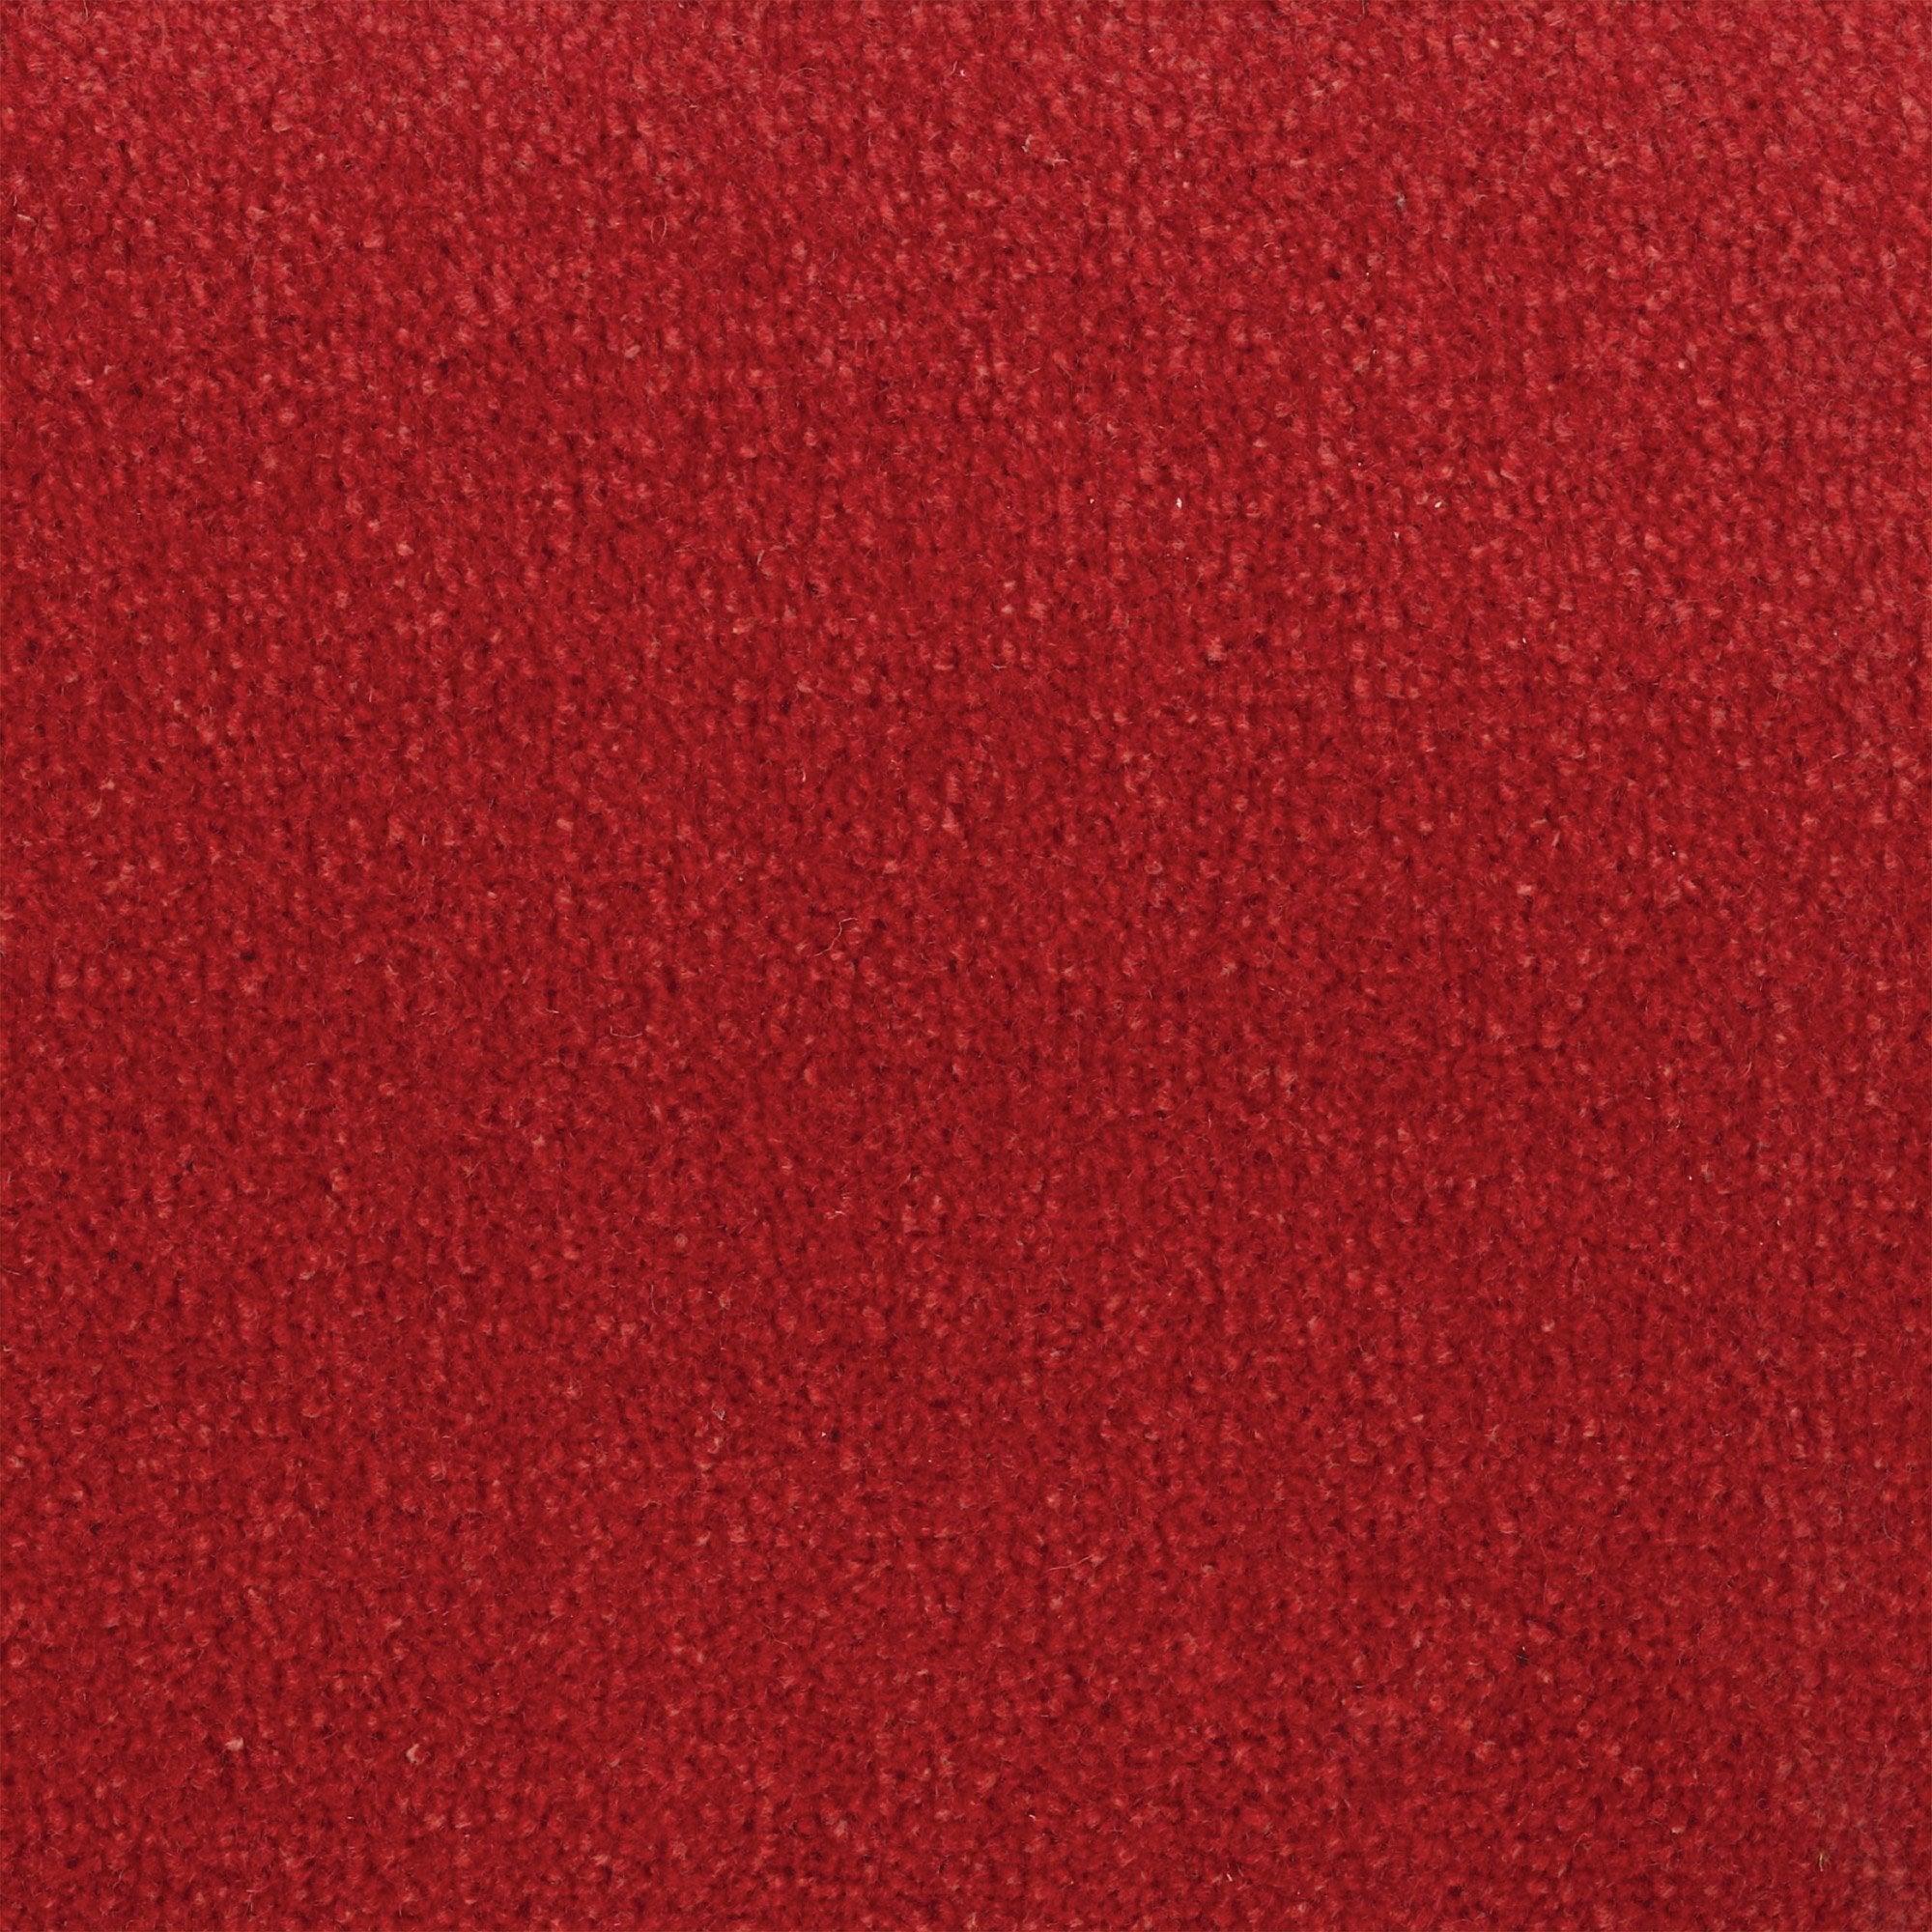 Moquette velours uni rouge, MONTECARLO RASPERRY 10, 4 m